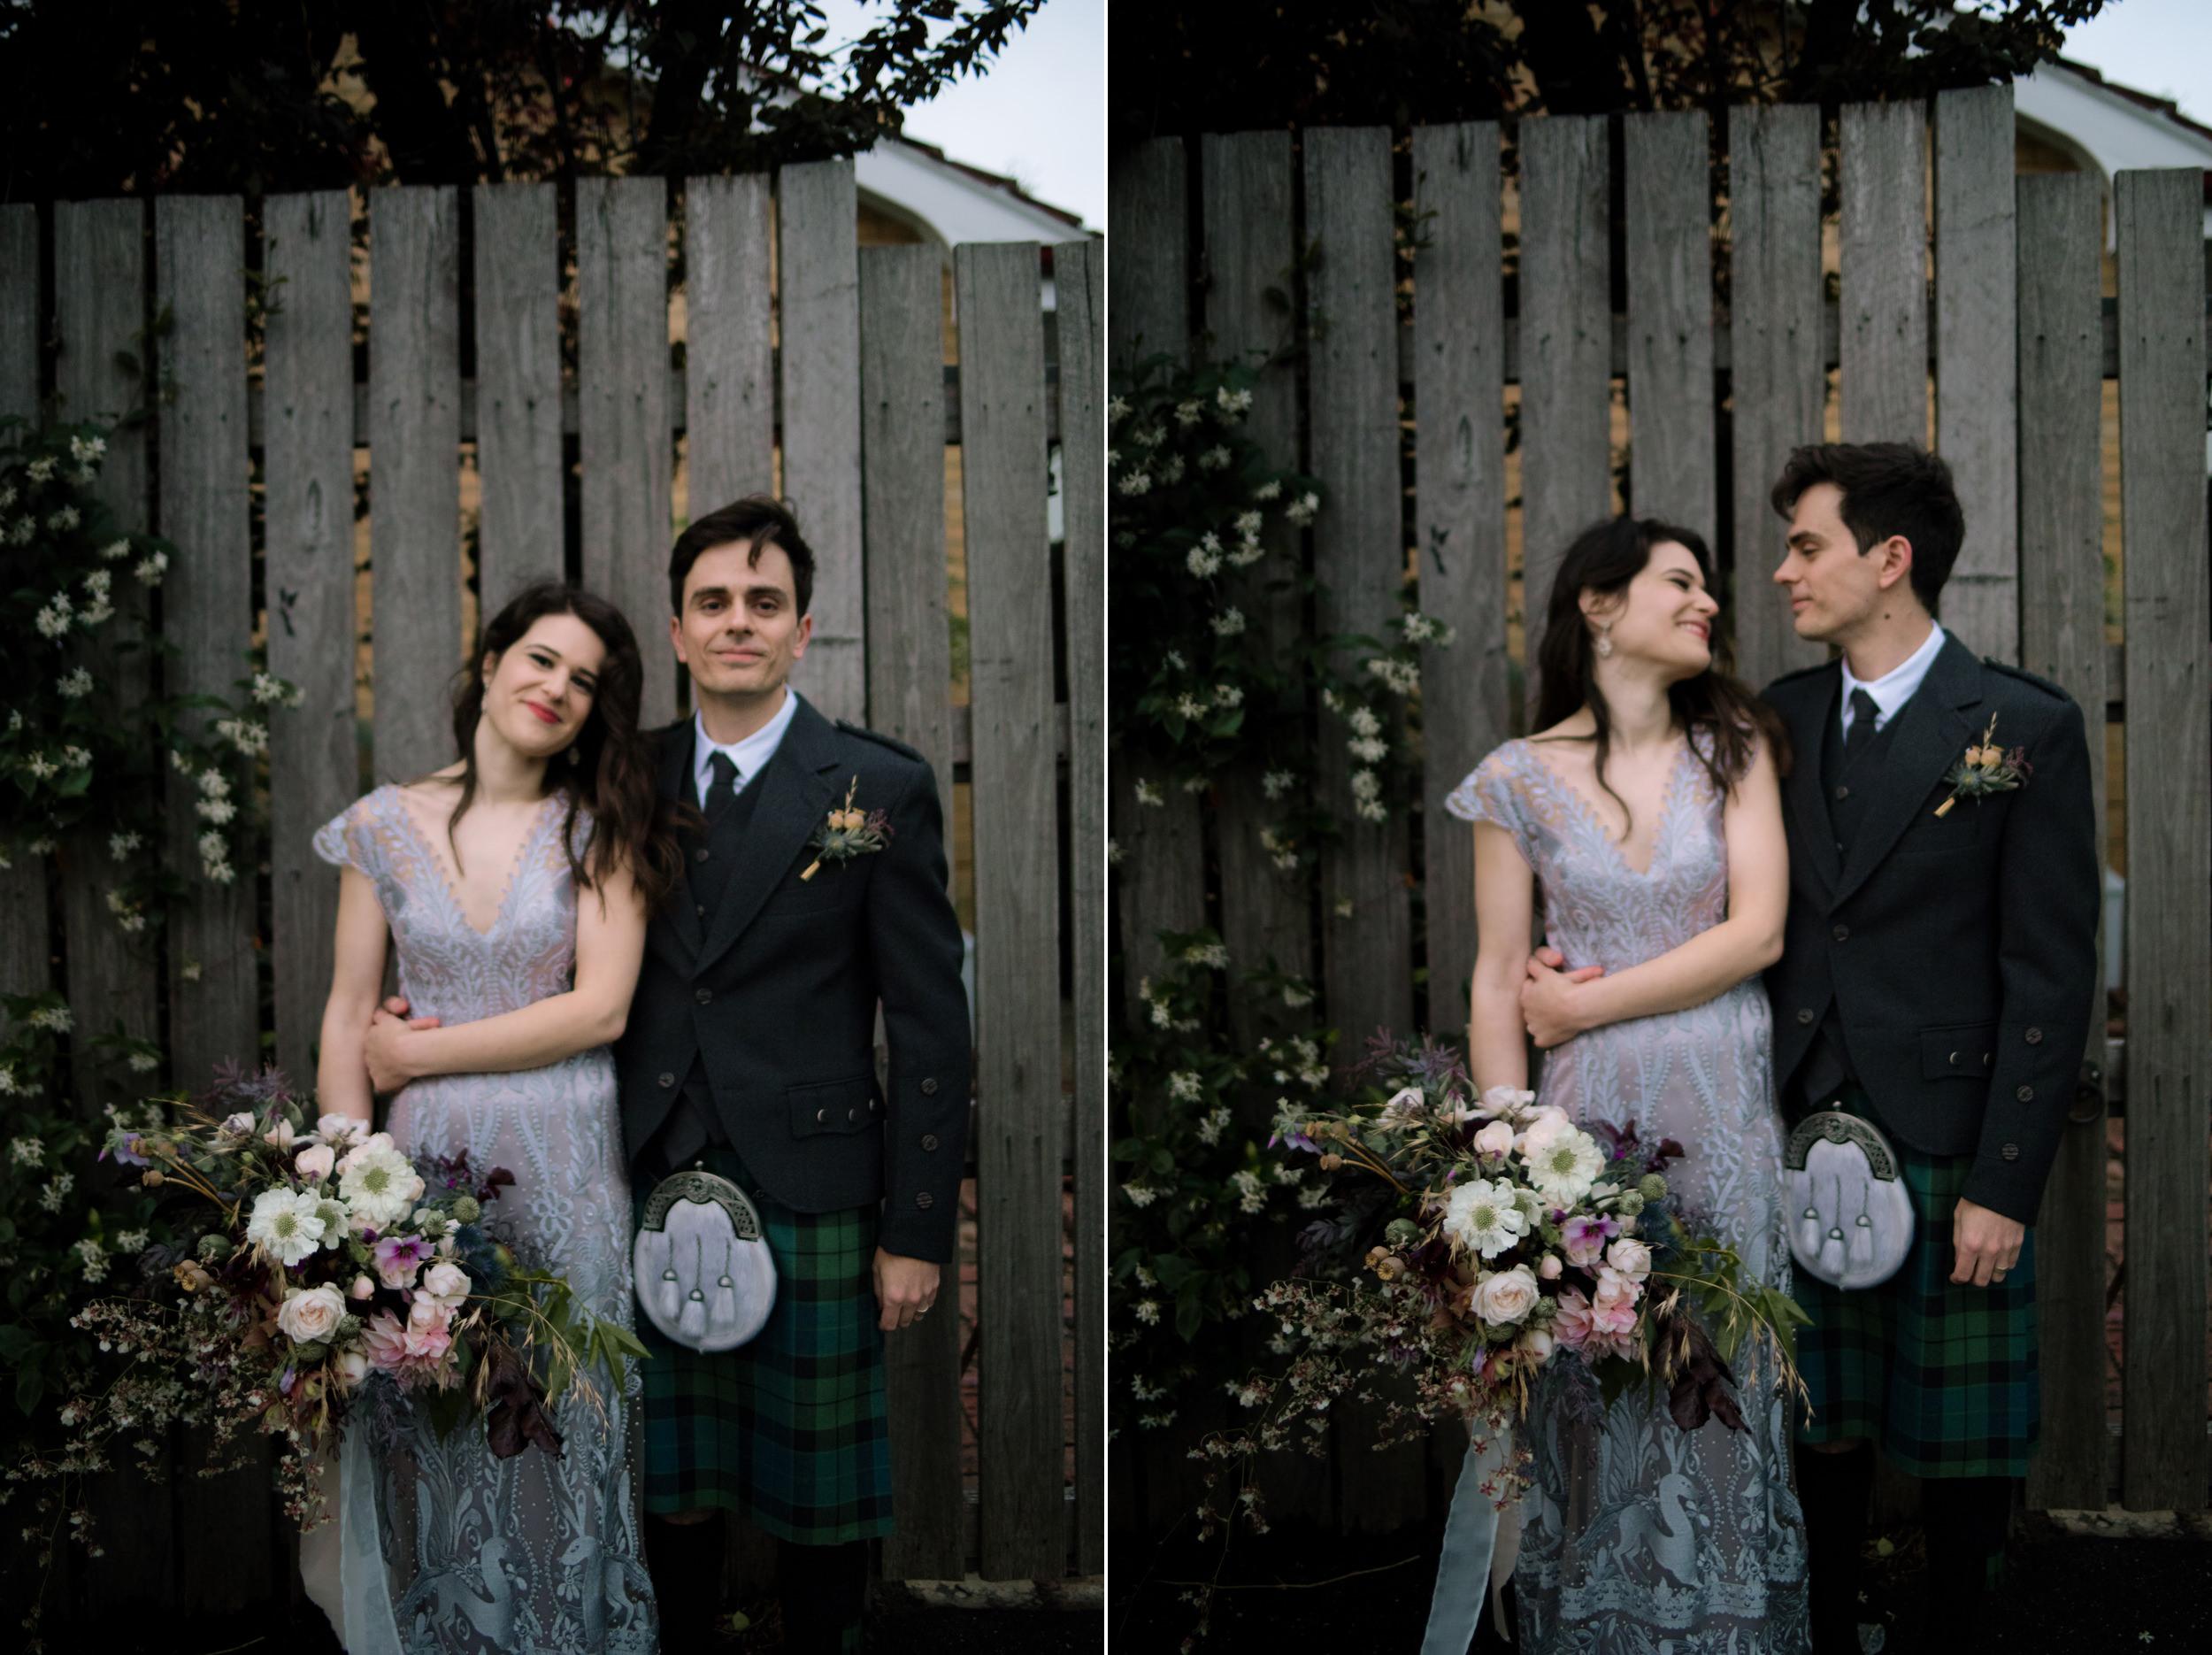 I-Got-You-Babe-&.Co.-Glasshaus-Wedding-Charlotte-Cameron0115.JPG